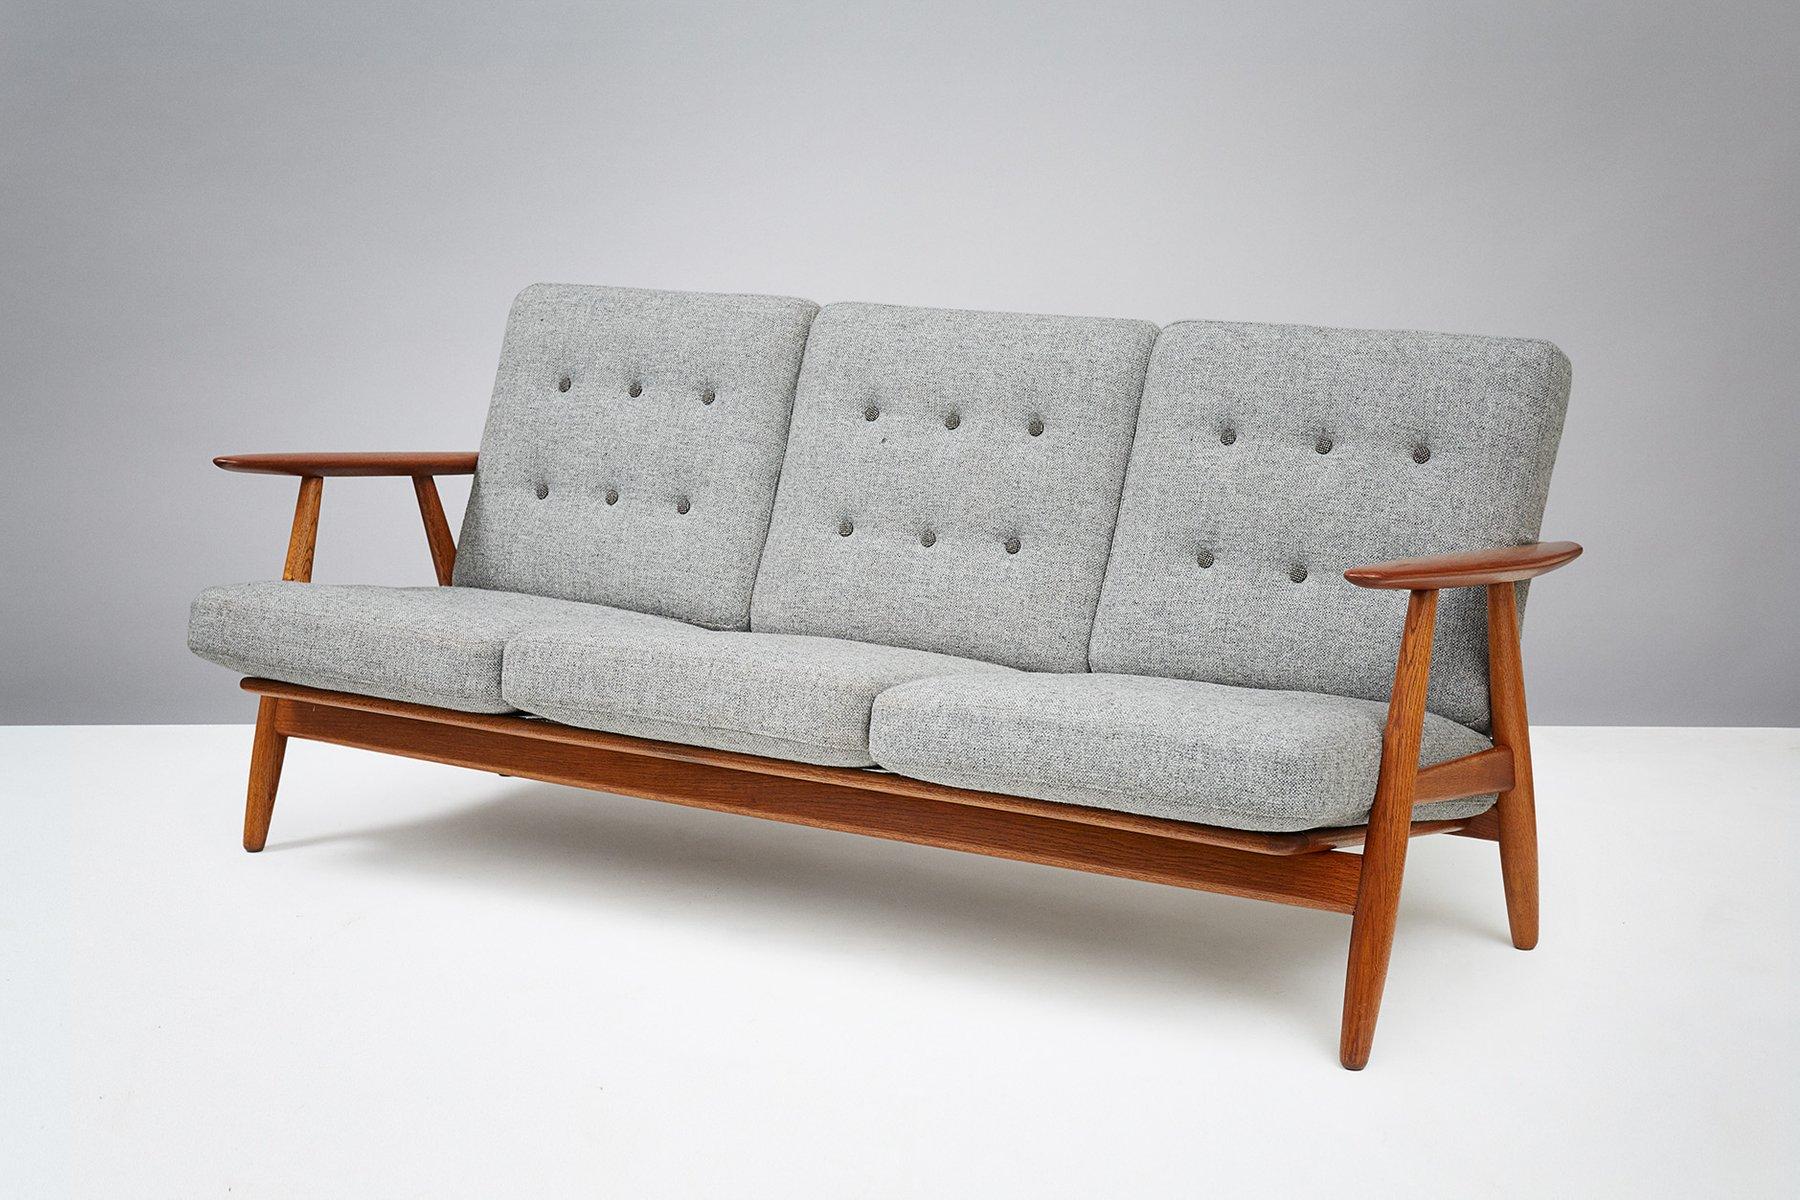 Ge 240 Cigar Sofa By Hans J Wegner For Getama 1955